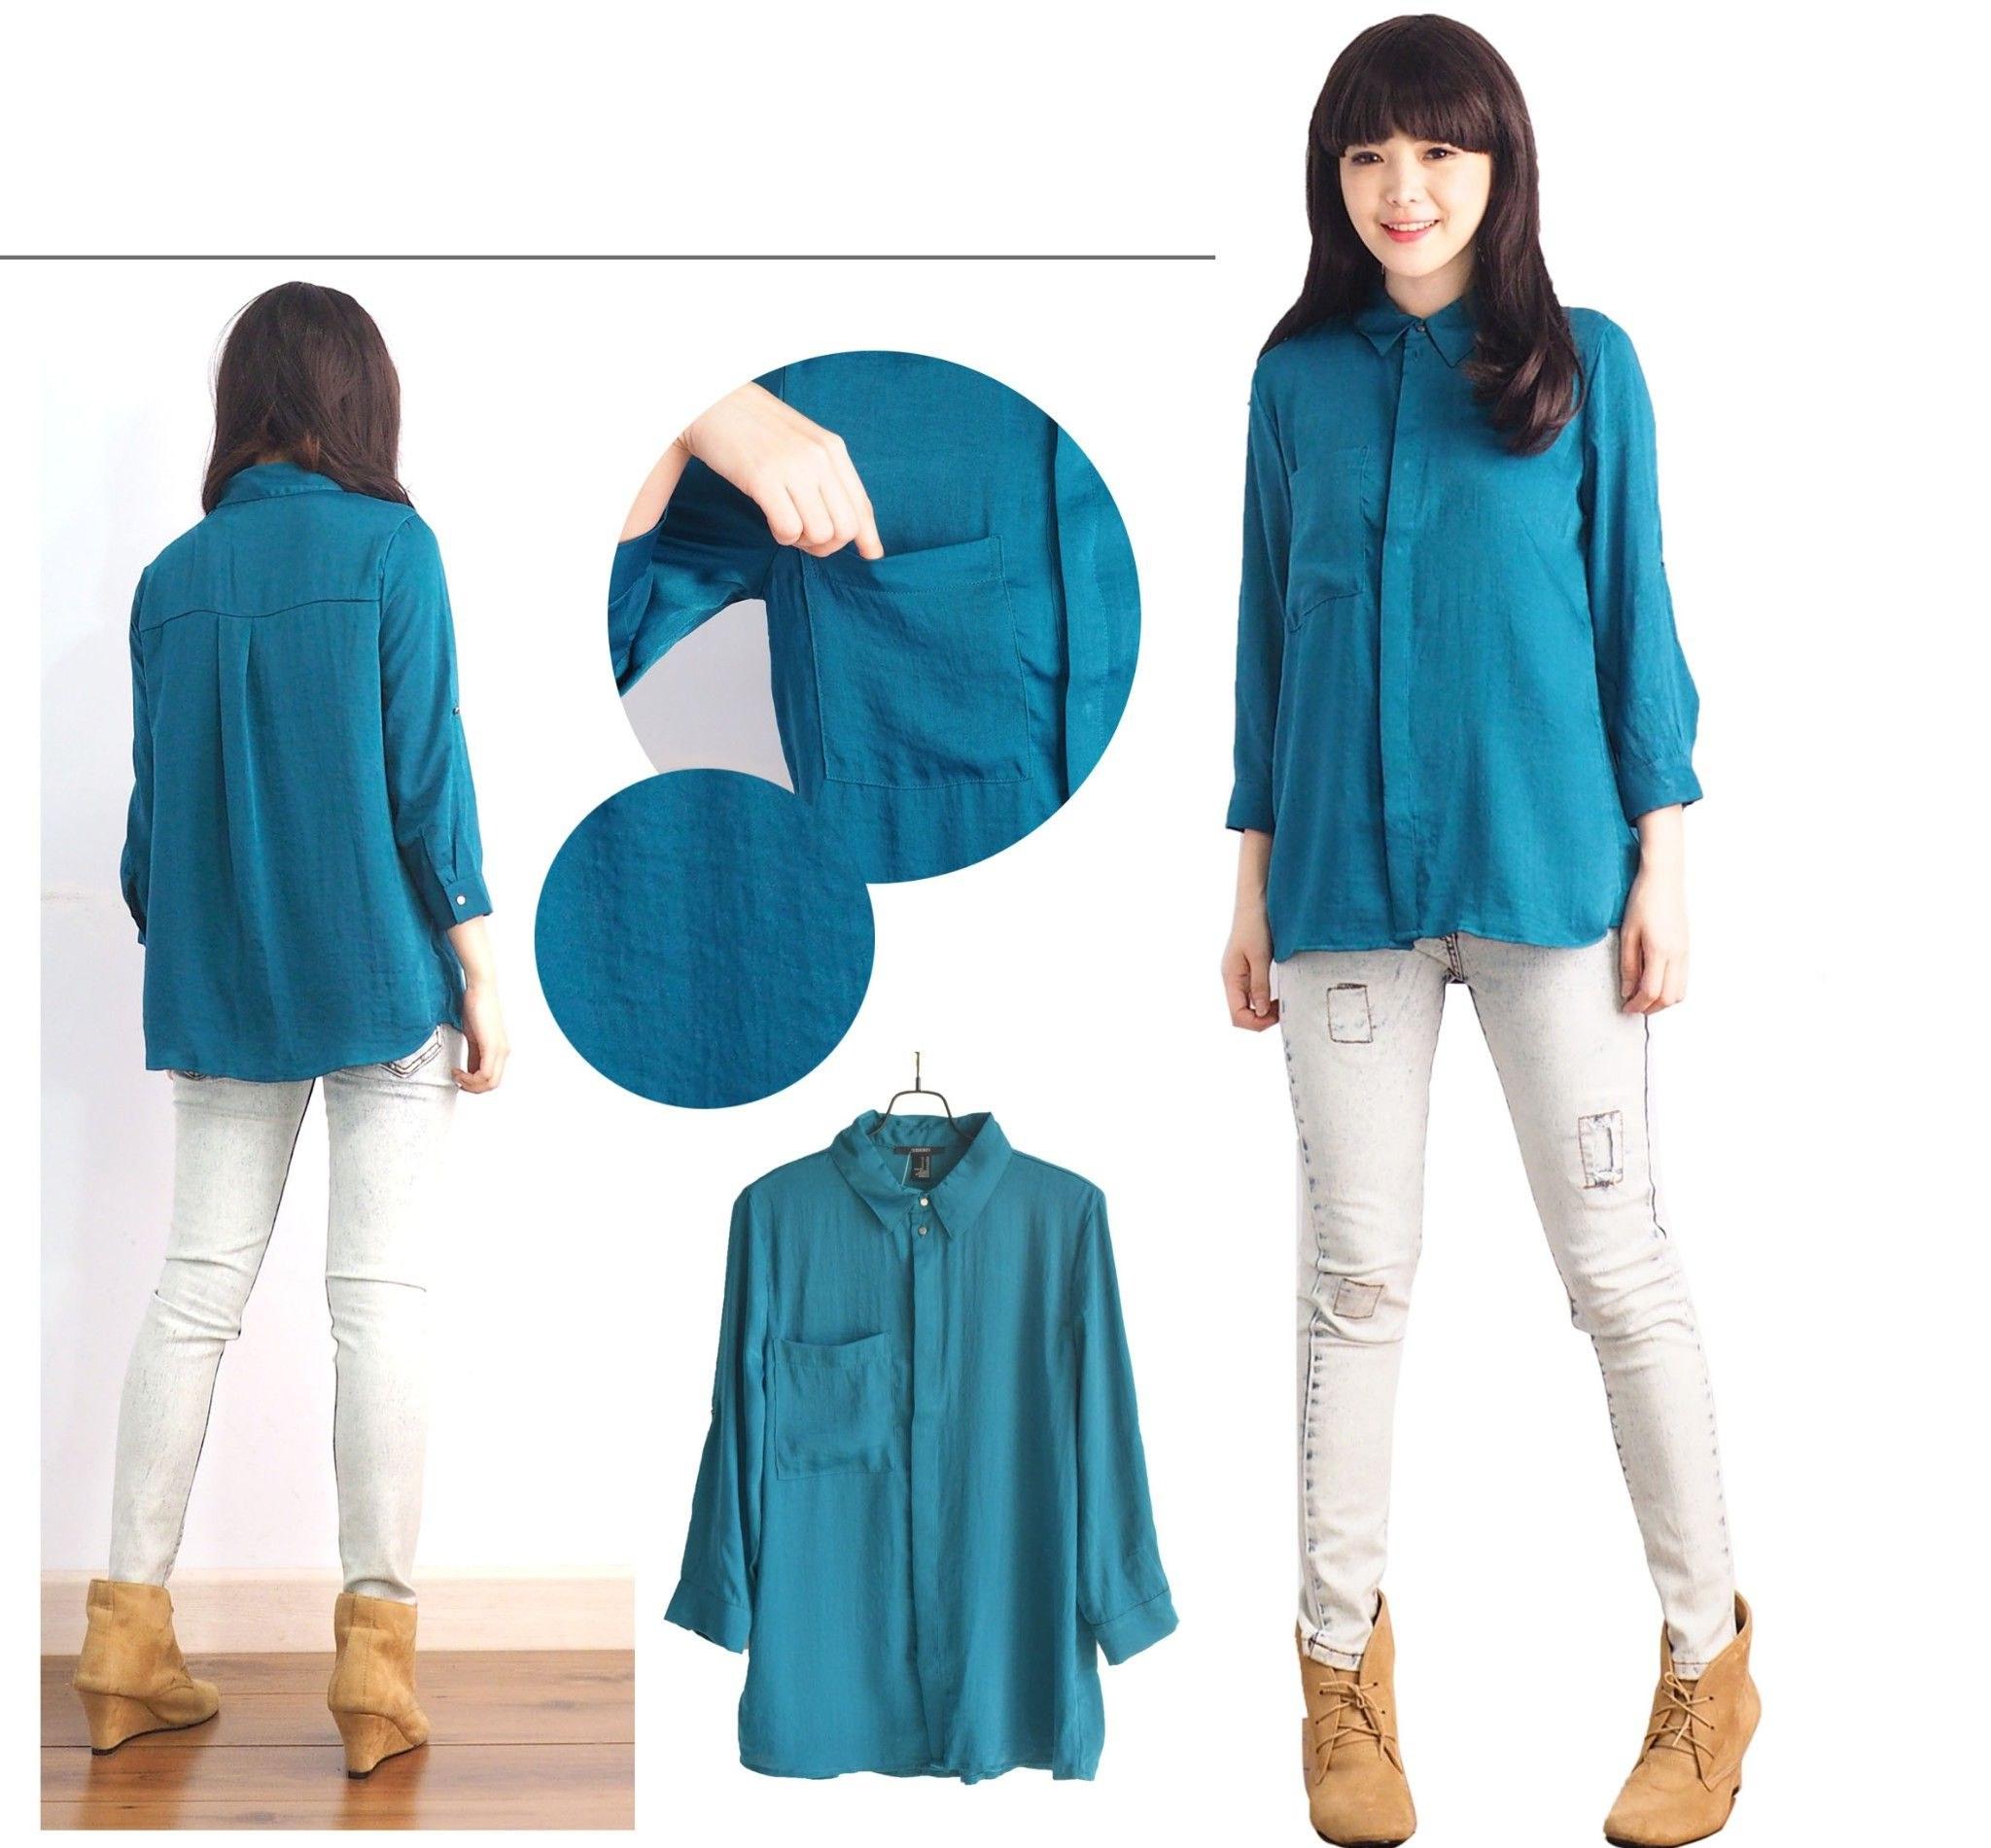 Design Baju Lebaran Terkini Q0d4 Blouse Muslim Model Pakaian Wanita Terbaru Pakaian Bayi